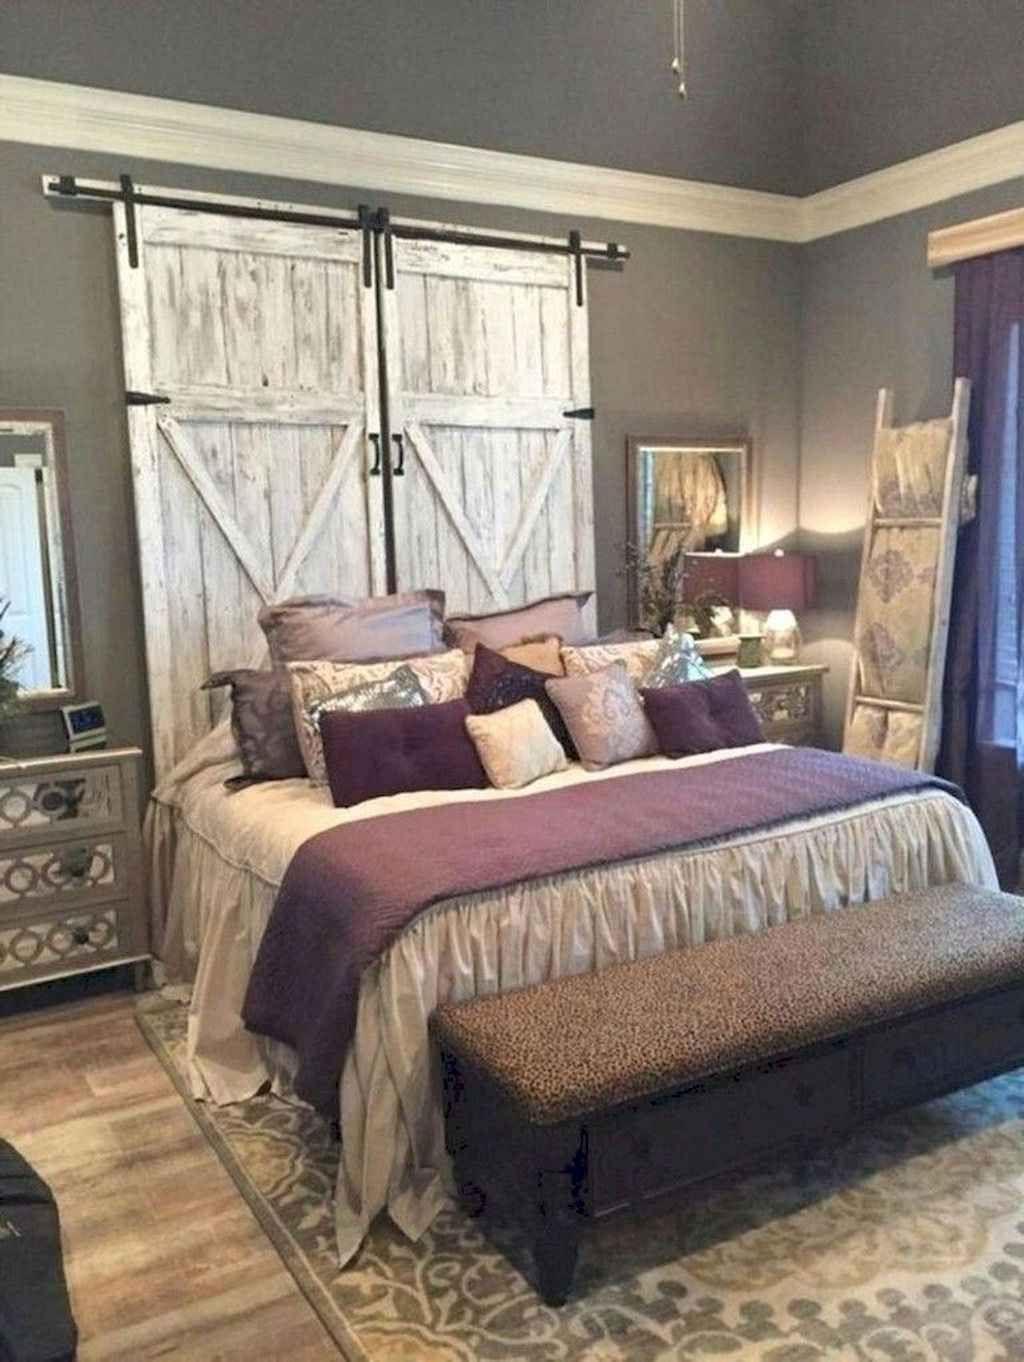 Modern Romantic Bedroom Designs: 75 Modern Farmhouse Bedroom Decorating Ideas